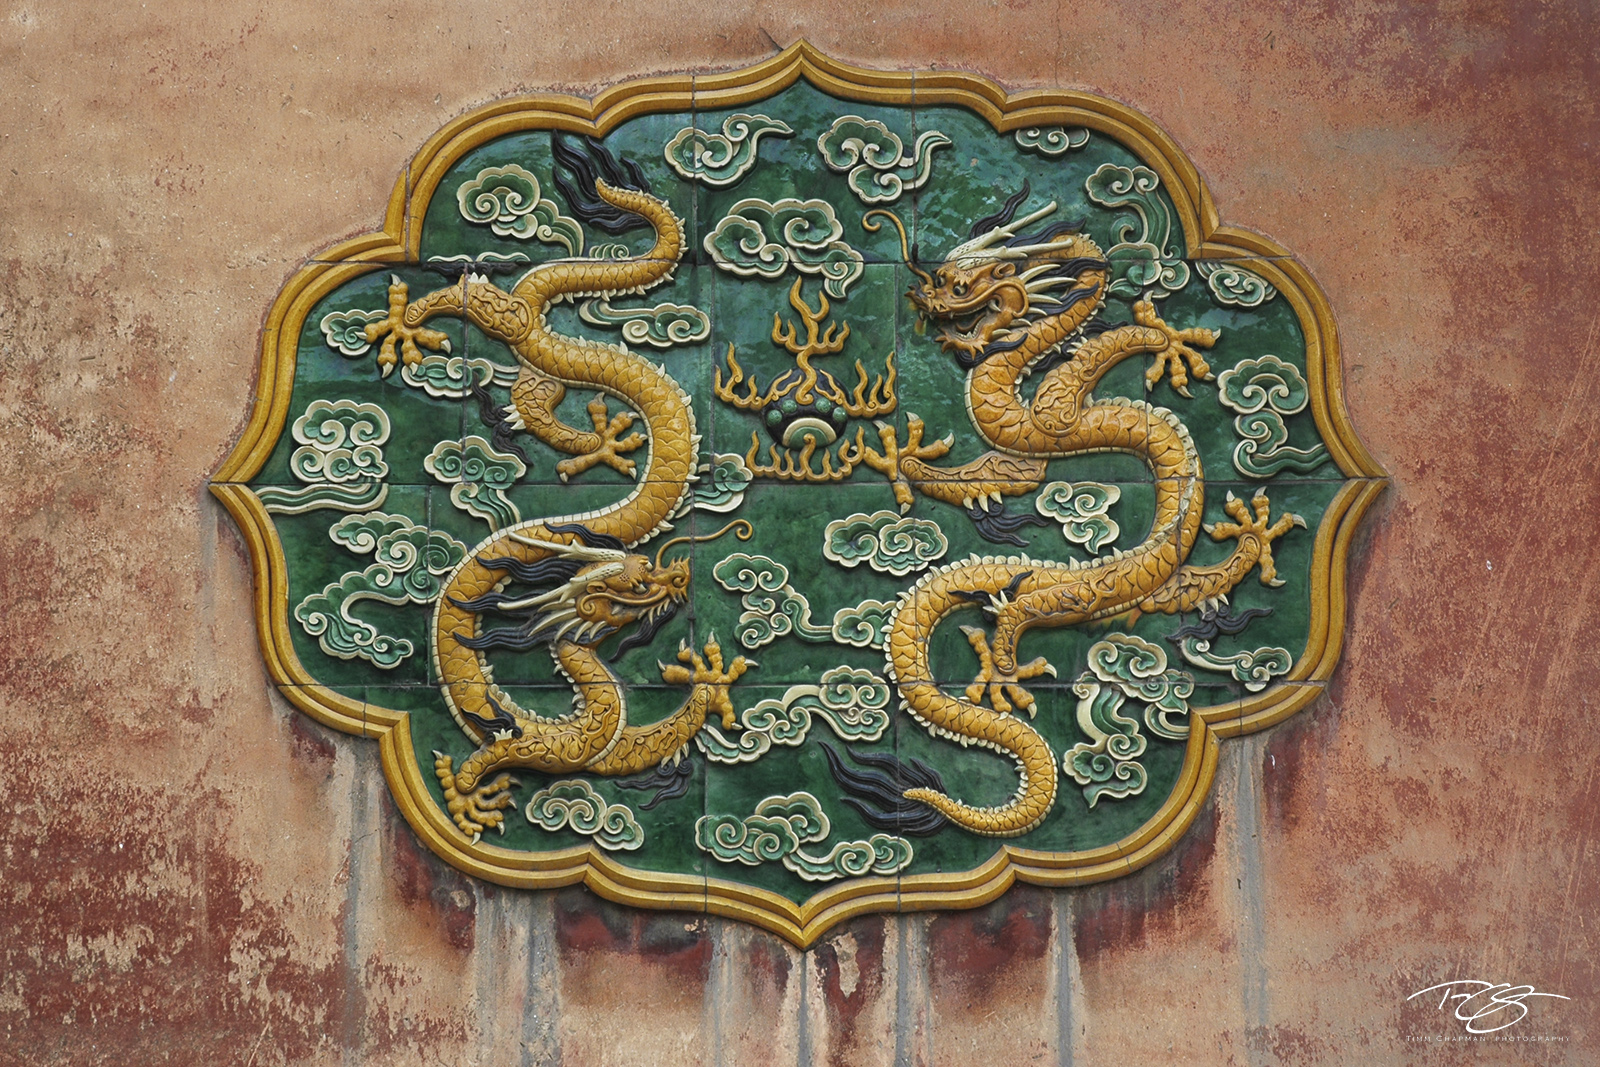 dragons, dragon, tile, forbidden city, beijing, peking, china, plaque, chinese, sculpture, peeling paint, yellow, green, texture, power, strength, photo